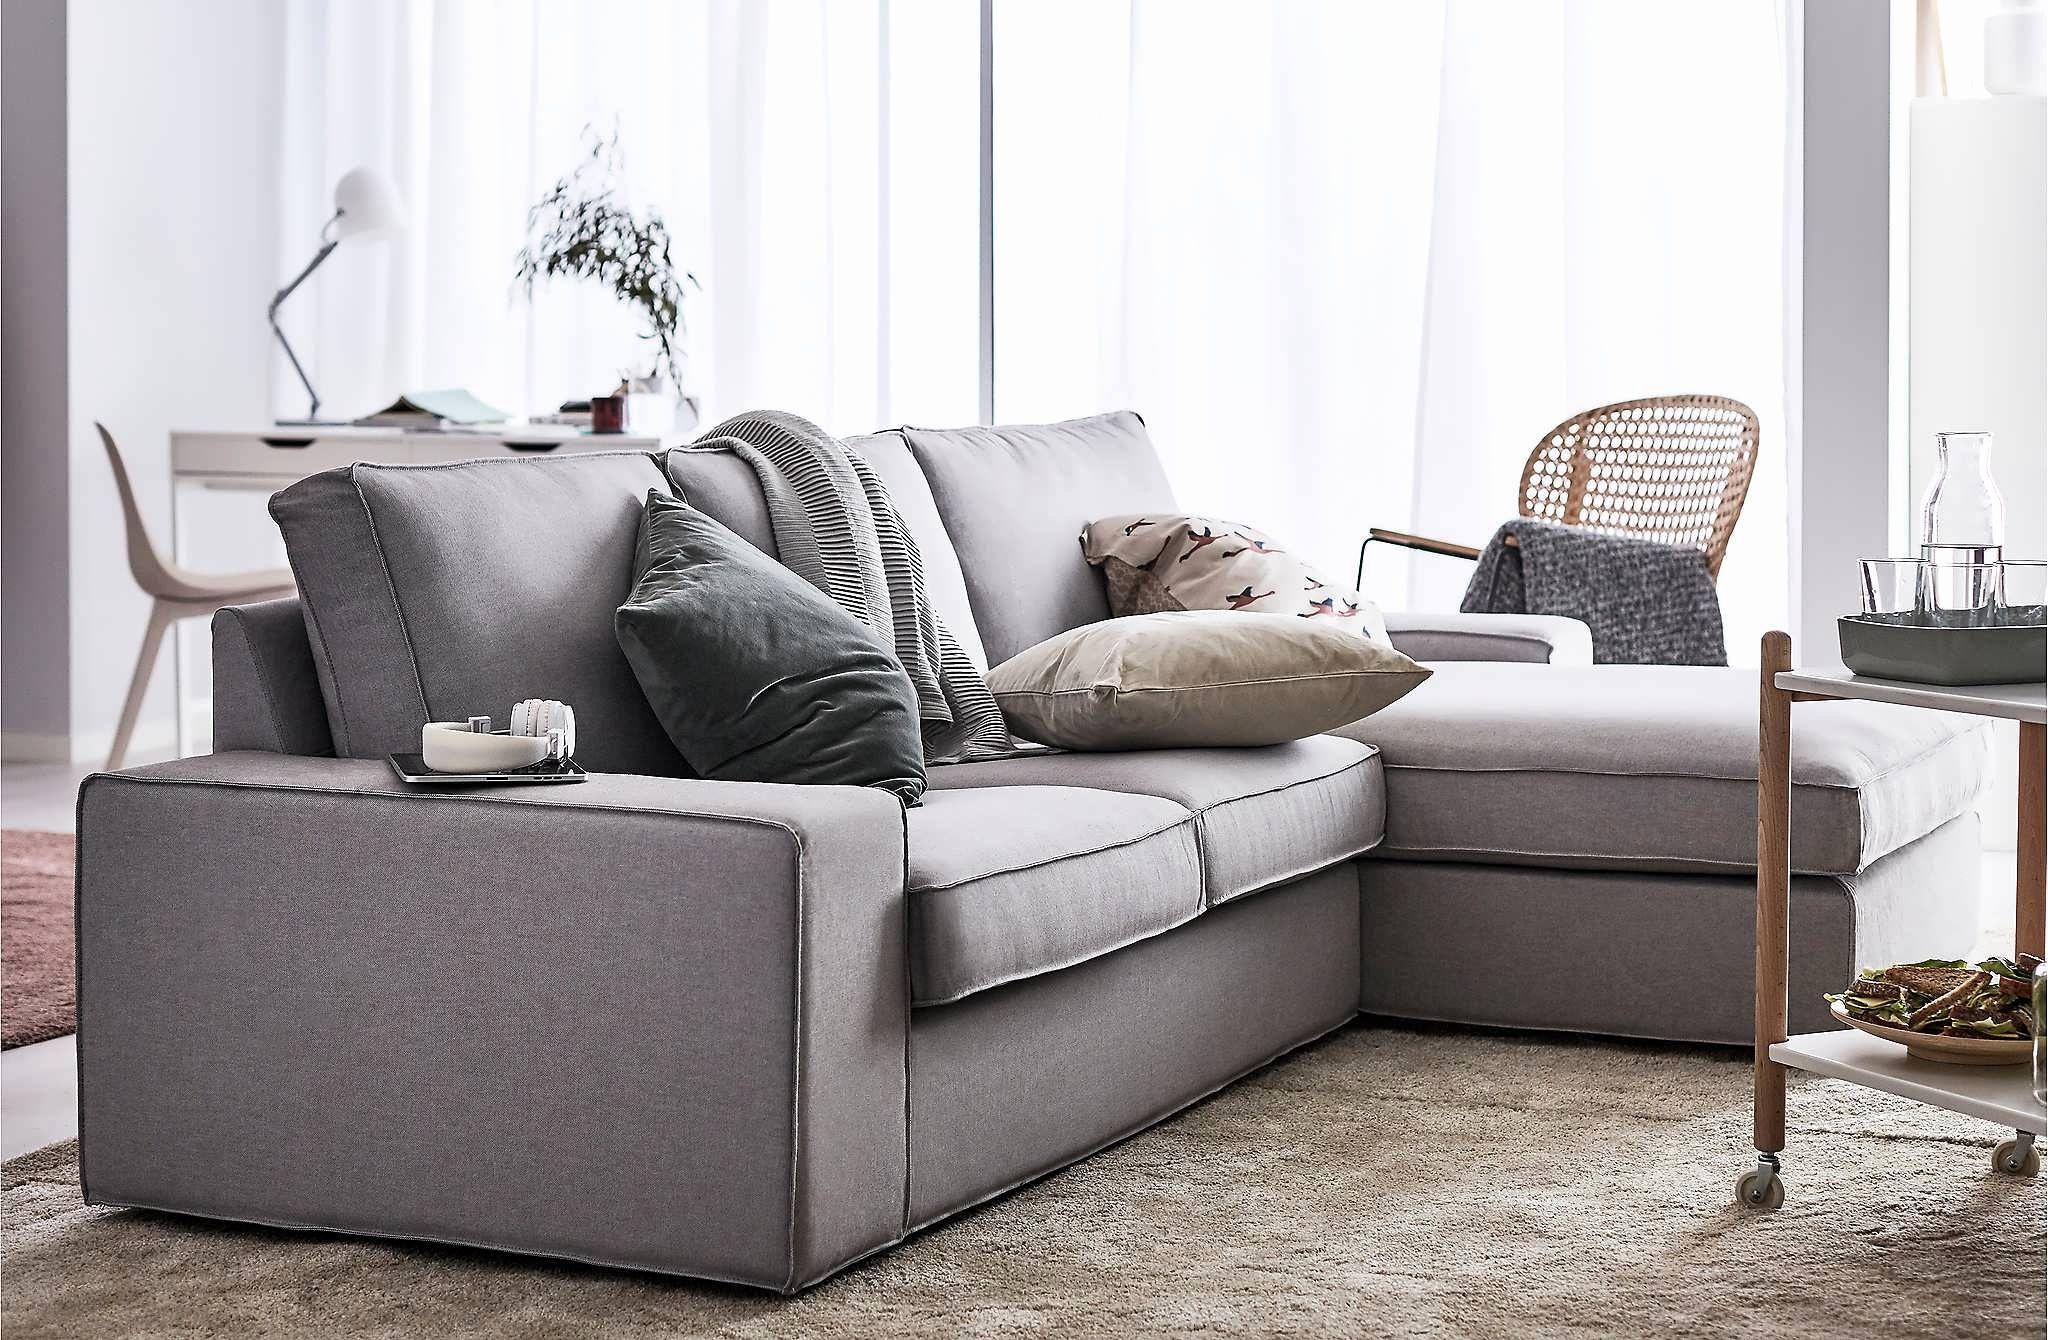 New Camelback Sofa Cover Pics 49 Most Good Blue Gray Living Room Designs Wilson Rose Garden